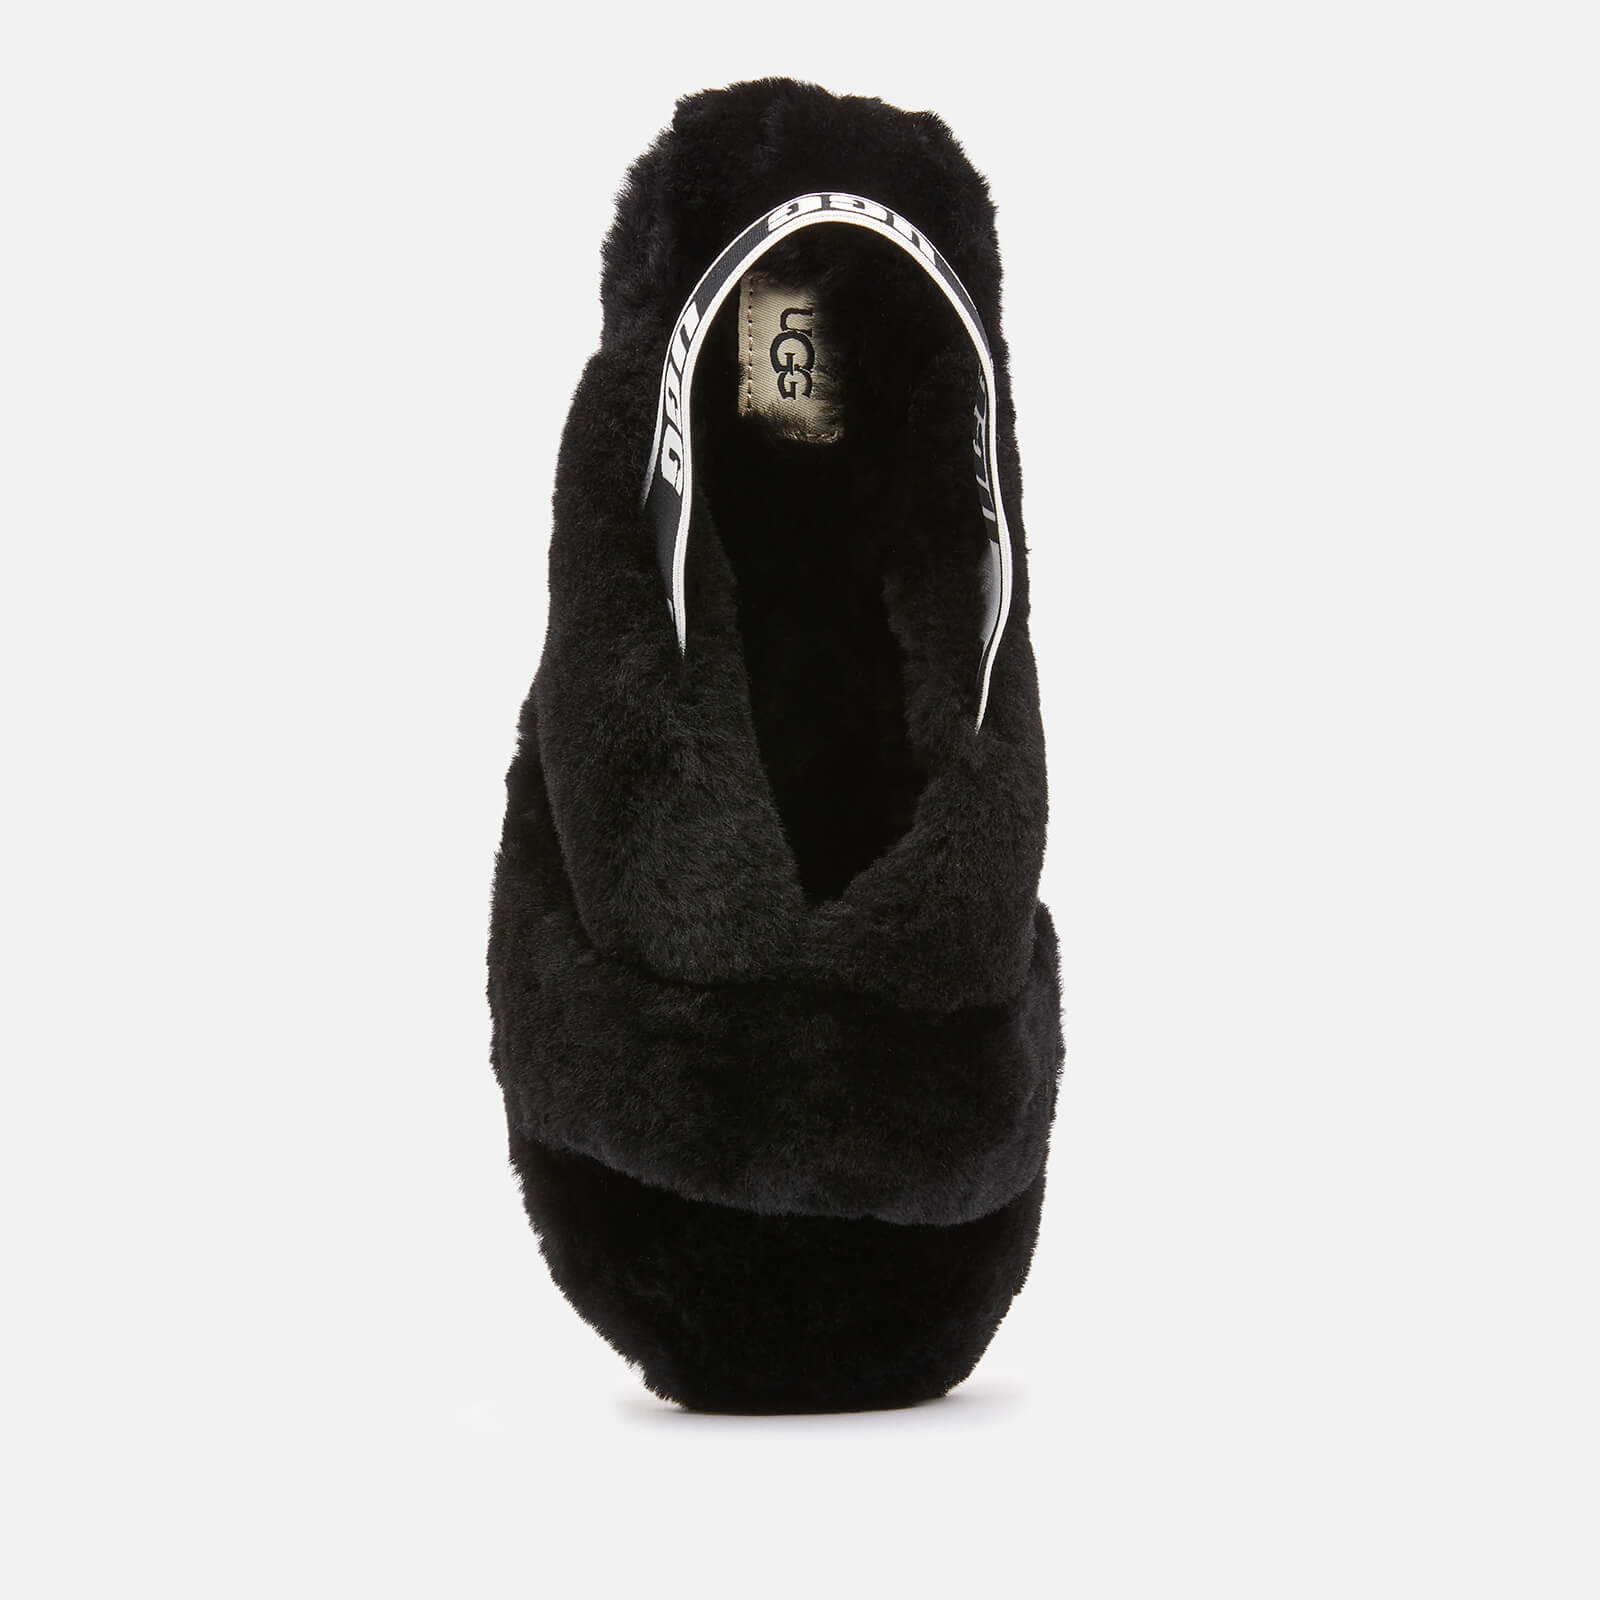 Ugg Women's Fab Yeah Sheepskin Slippers - Black - Uk 3